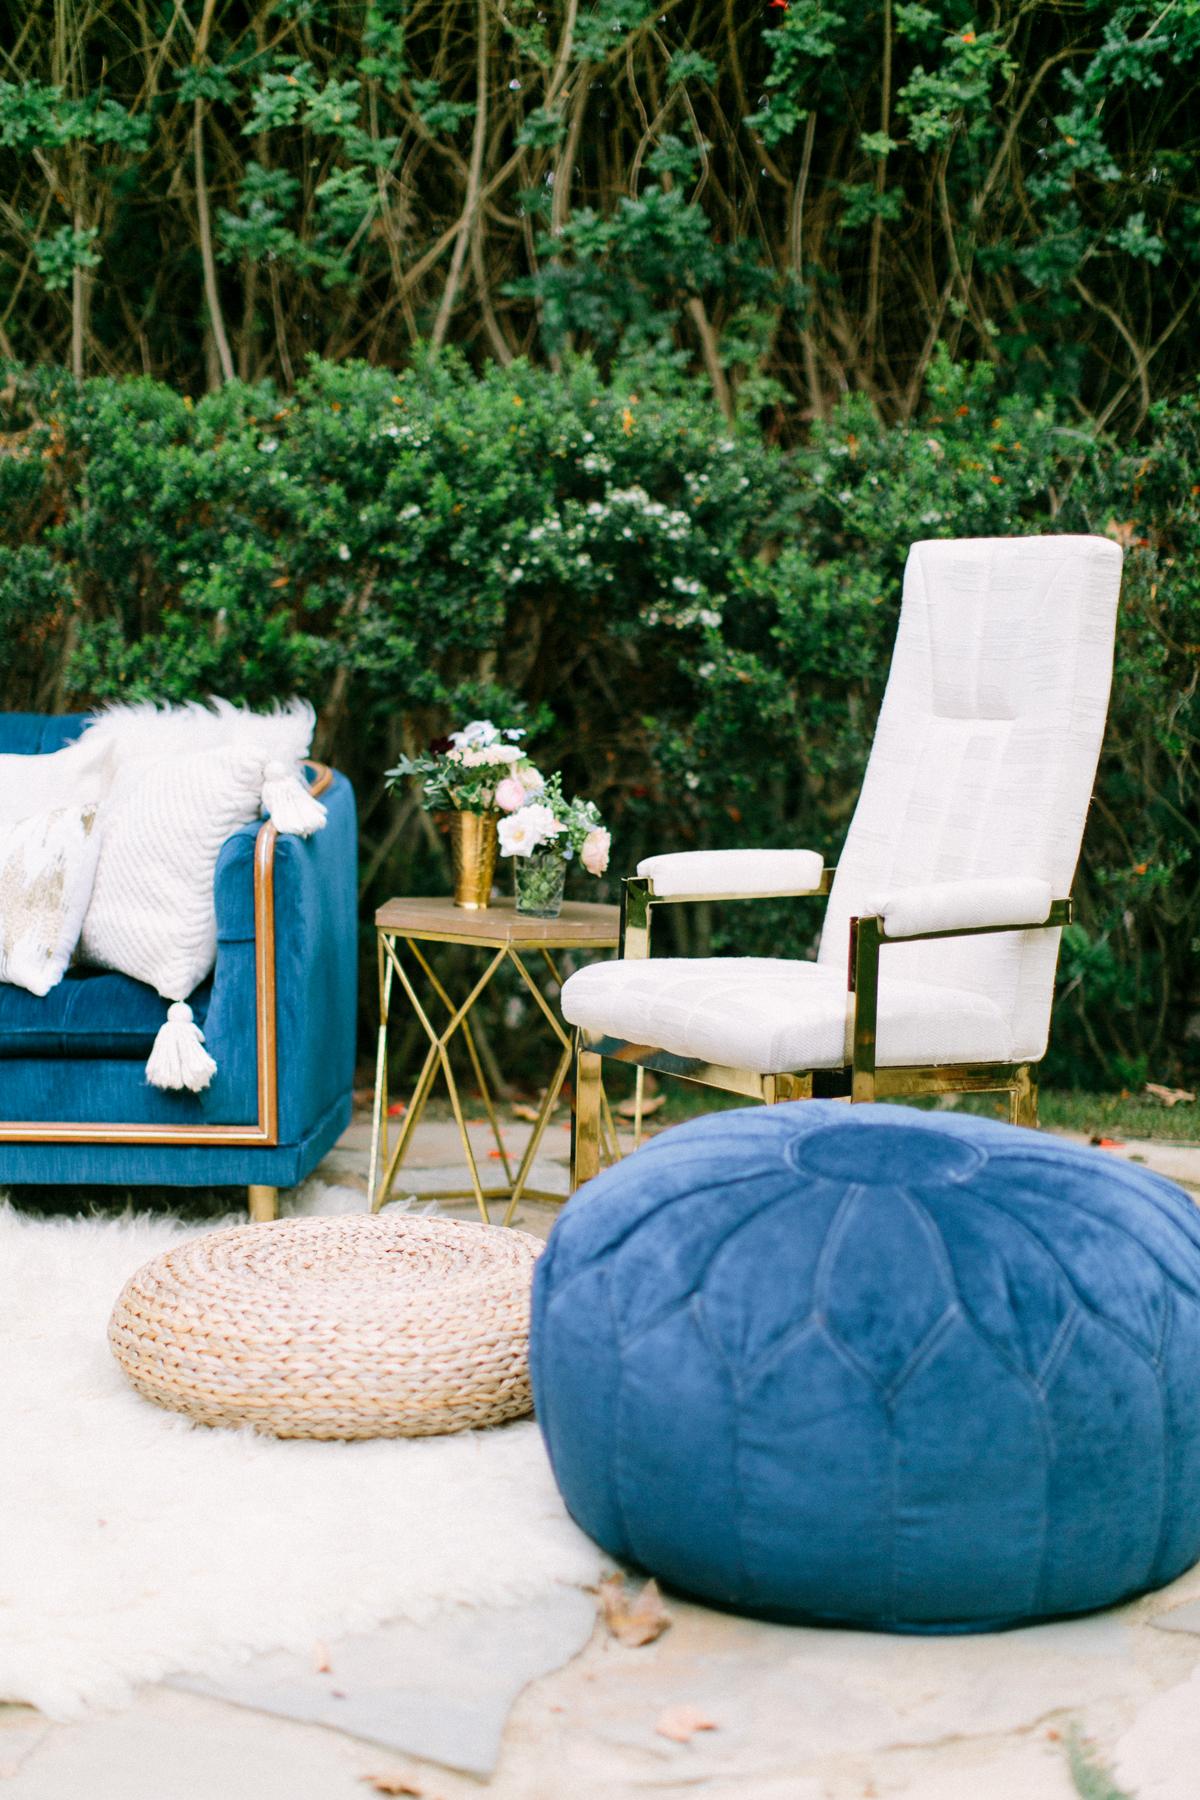 woven rattan wedding decor ottoman atop white fur rug at outdoor lounge area